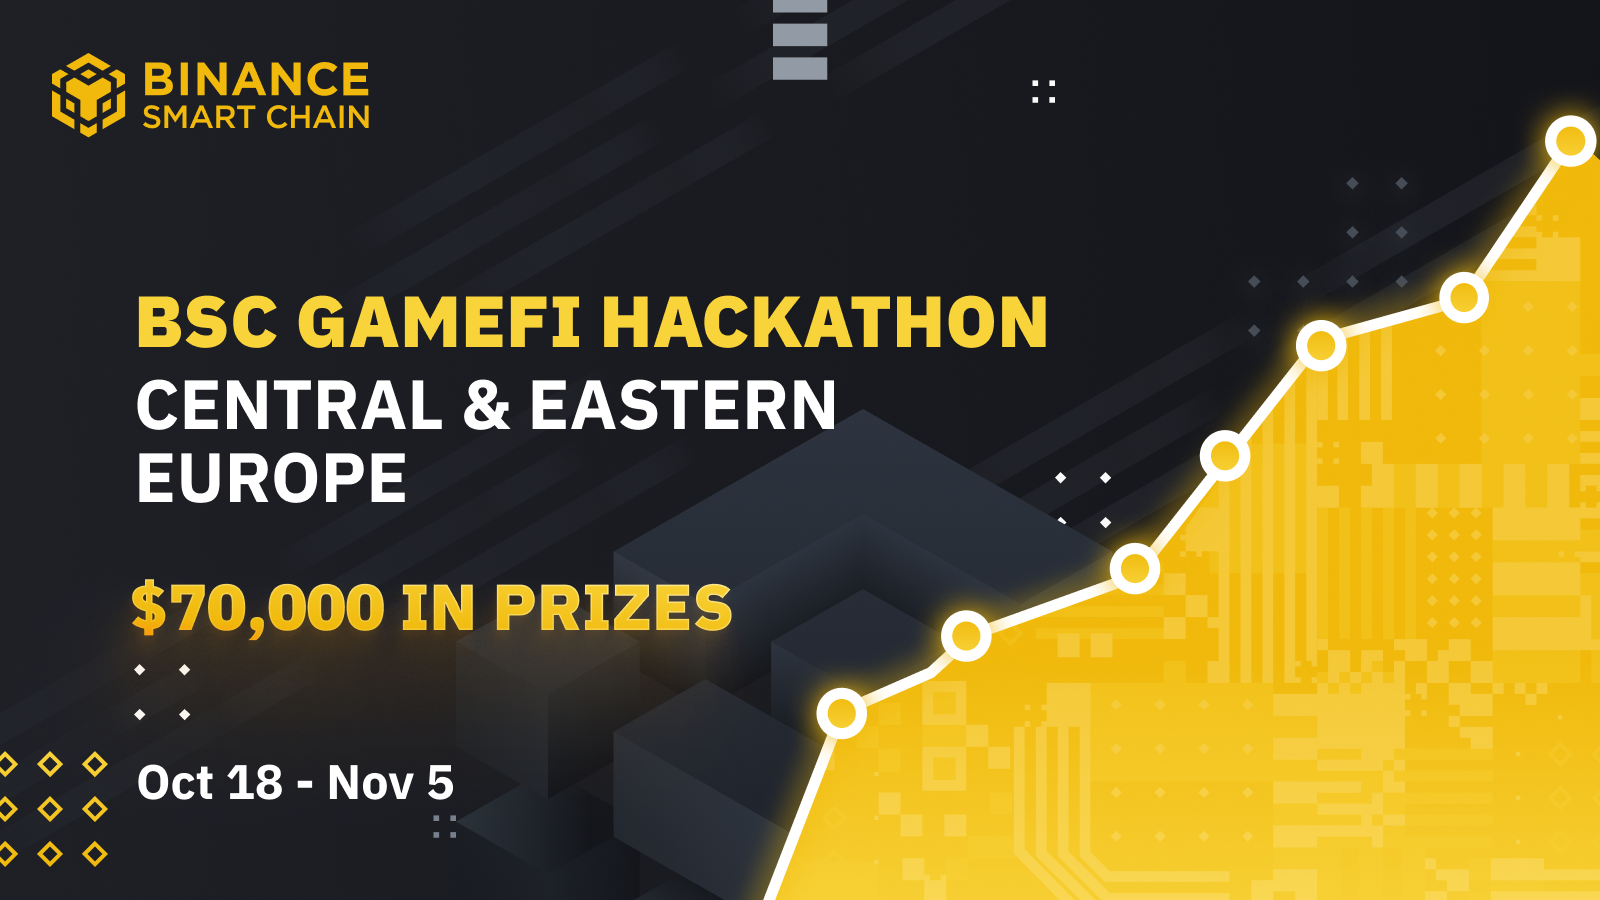 BSC GameFi Hackathon for Central & Eastern Europe